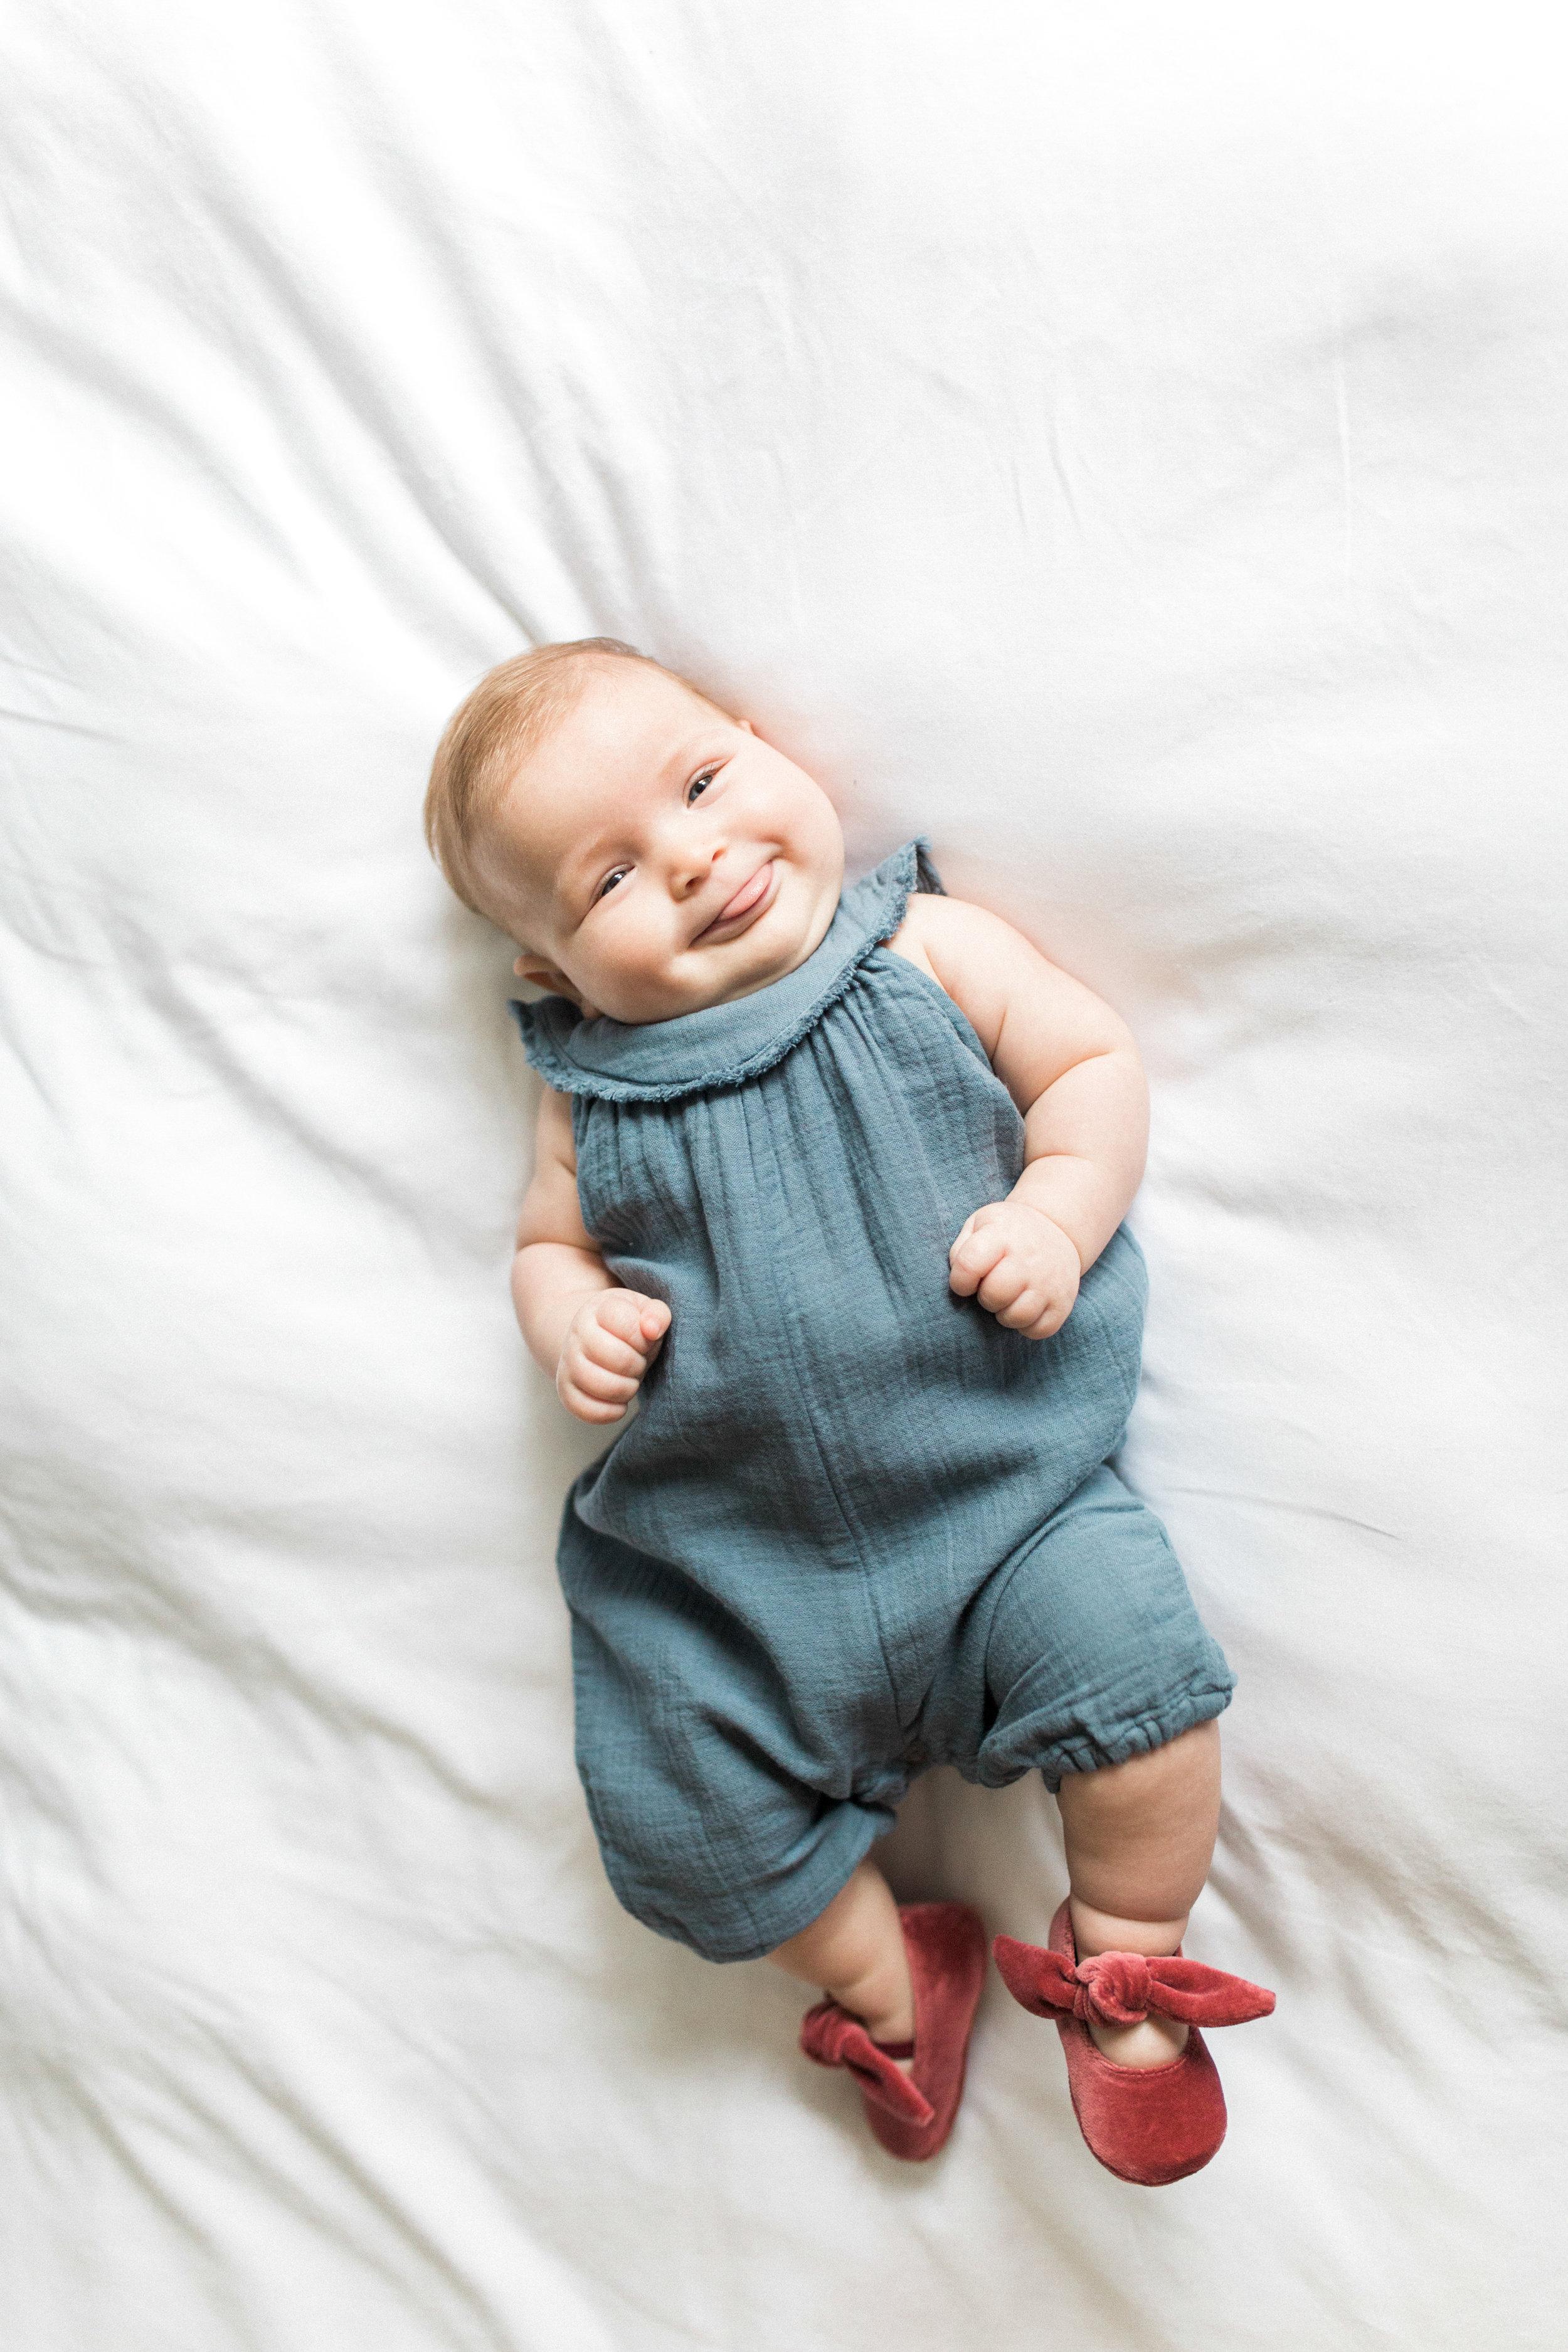 Elza Photographie - Toronto baby photographer - Film and digital - Bright and airy - Mastin Labs - Motherhood